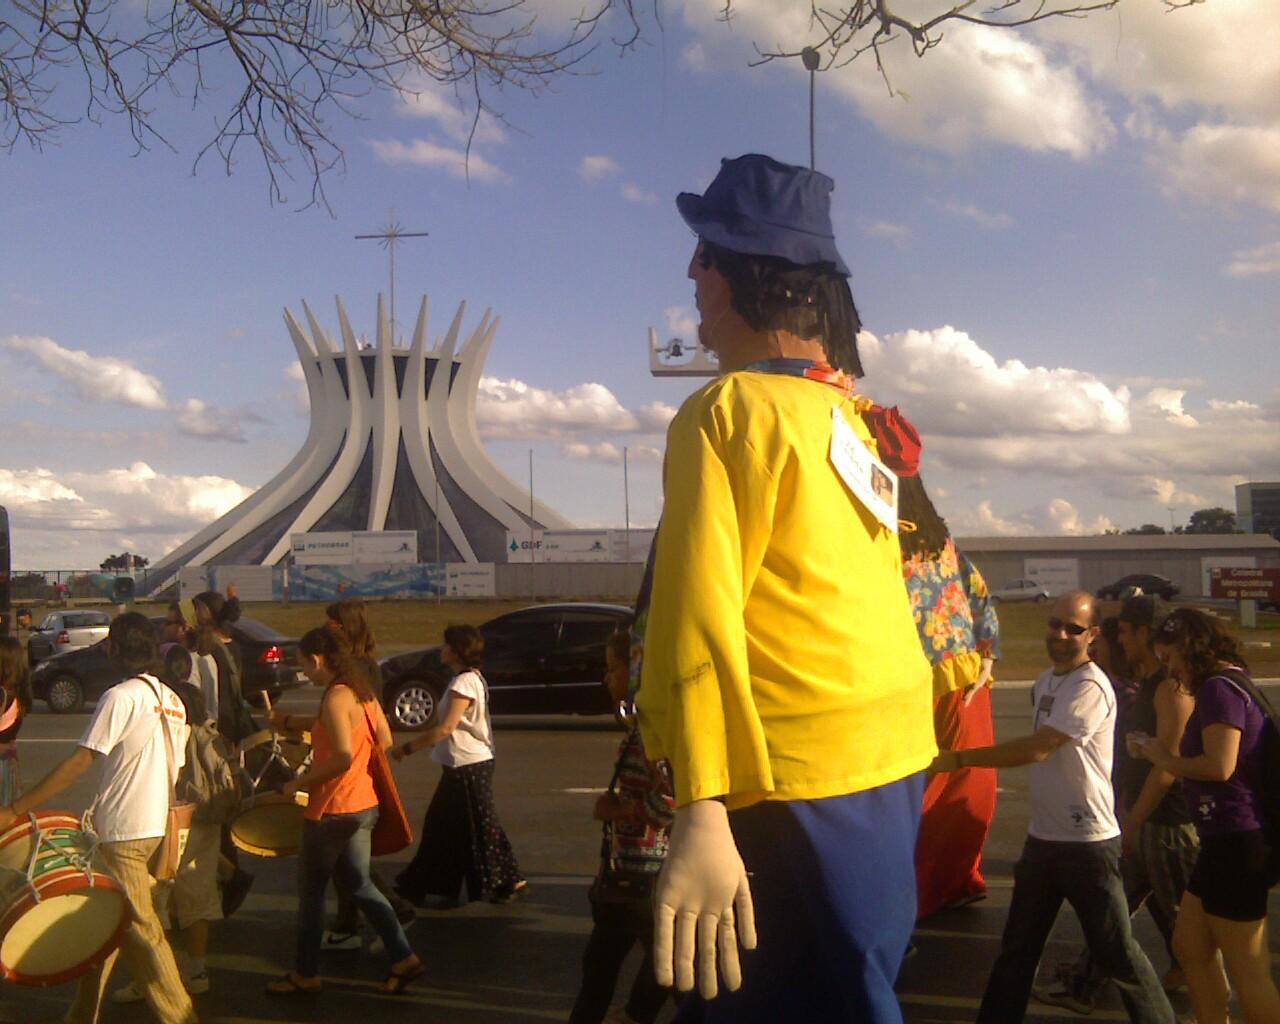 #pontosdecultura #brasilia